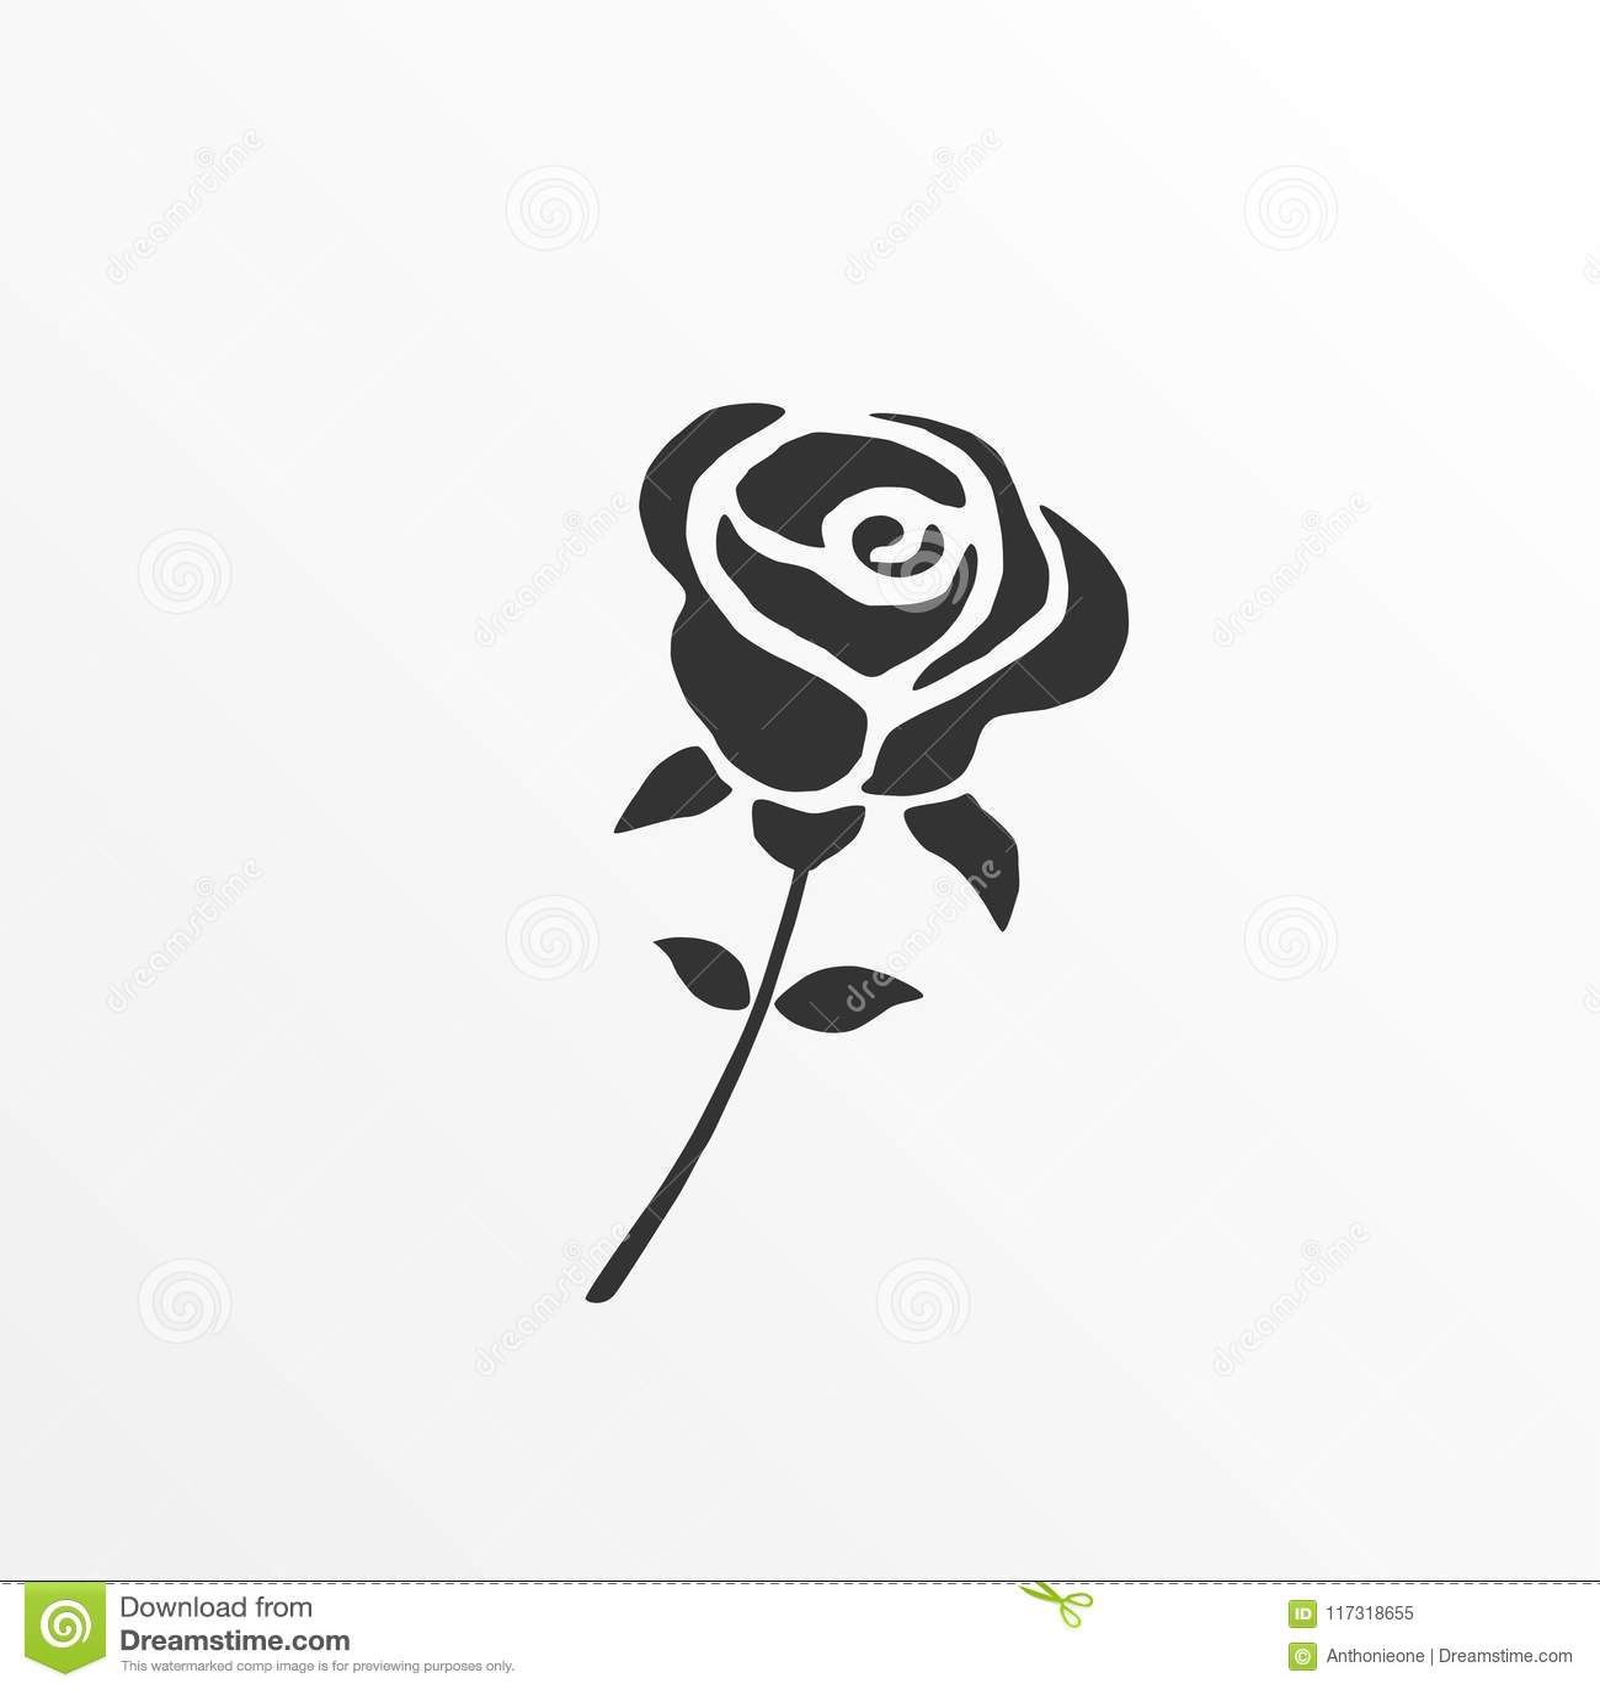 Rose Silhouette Icon Stock Vector Illustration Of Design